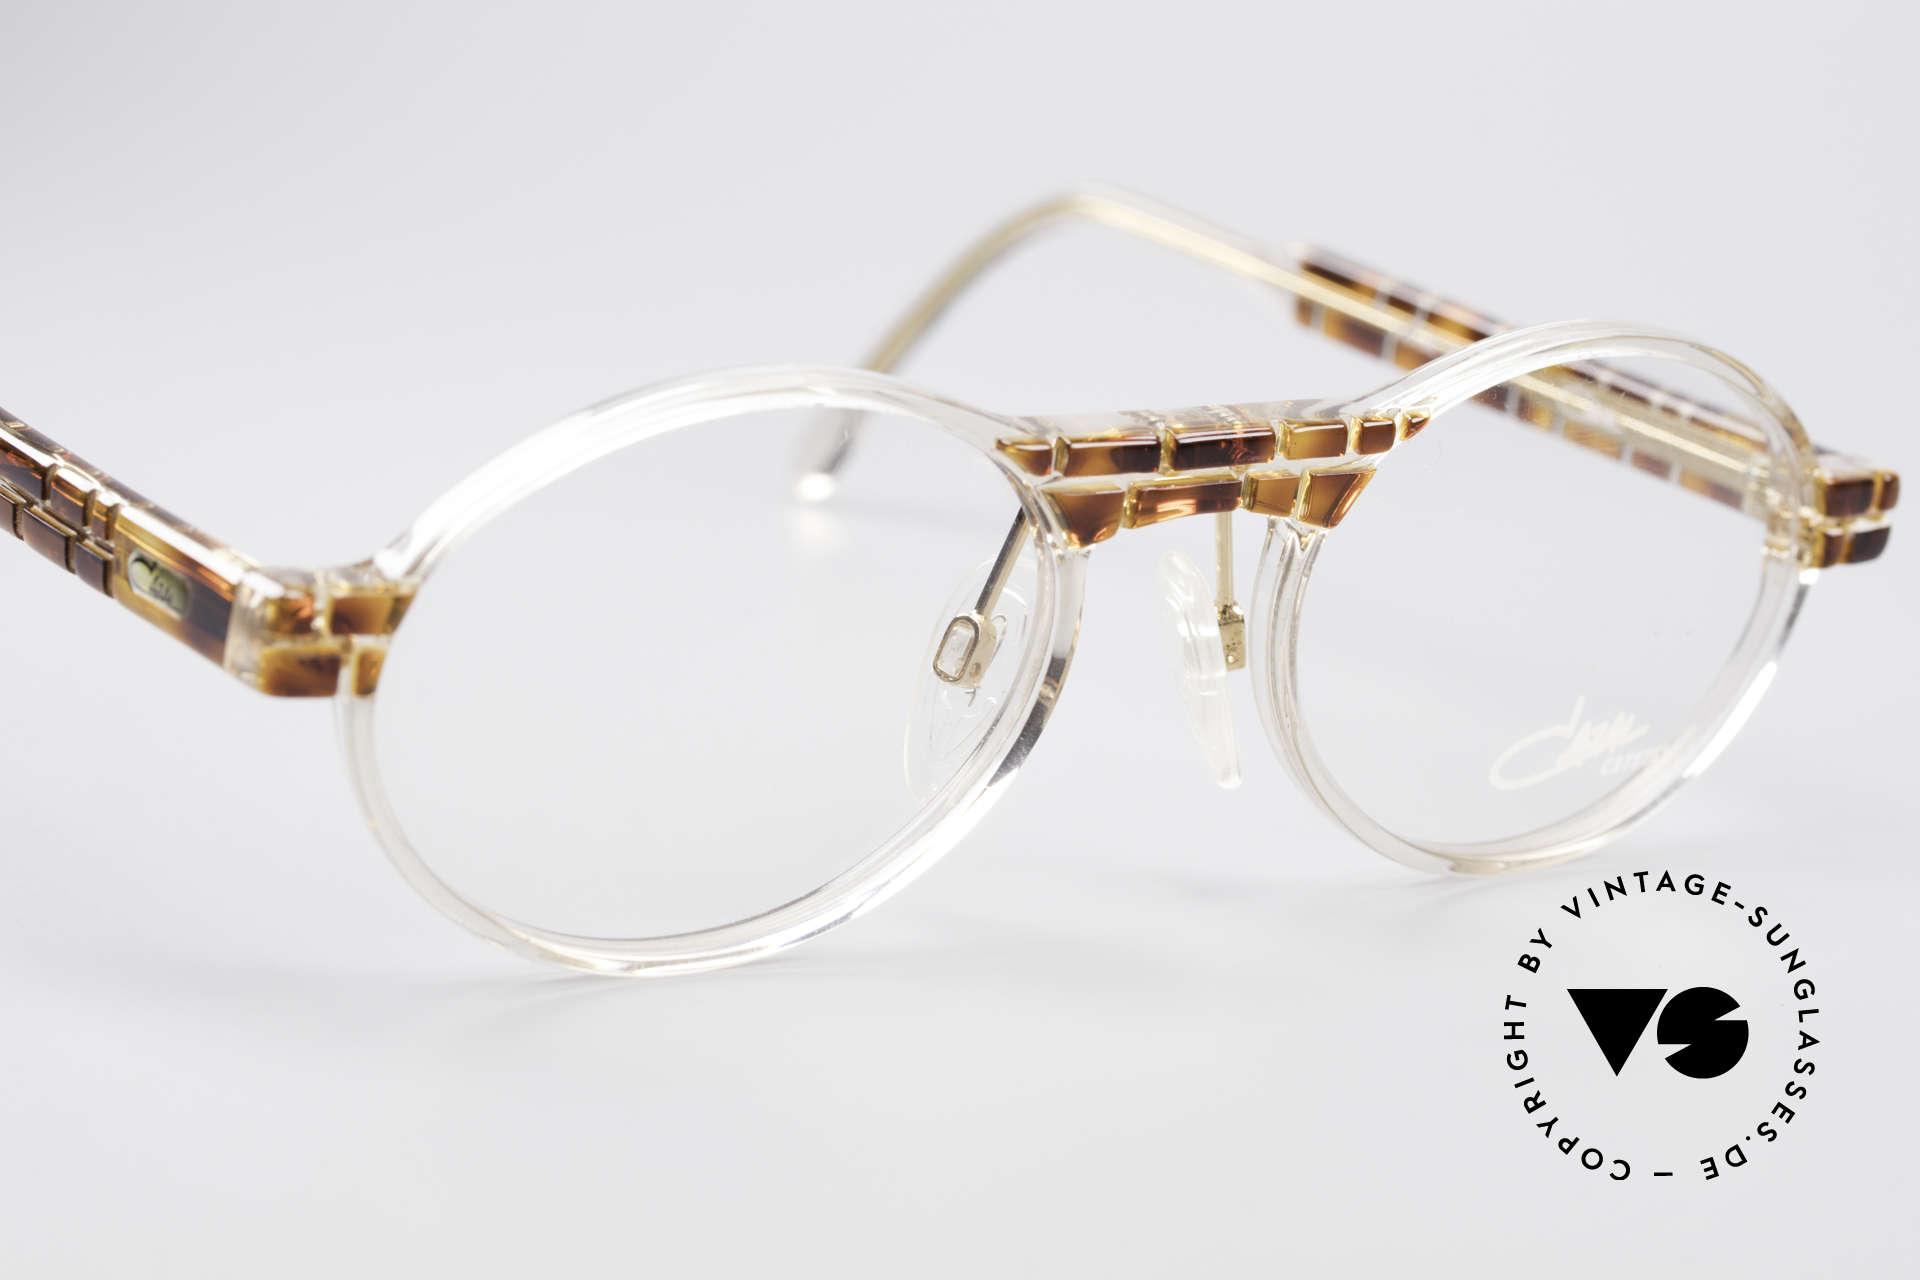 Cazal 510 Crystal Limited Vintage Cazal, unworn (like all our rare vintage Cazal Crystal frames), Made for Men and Women